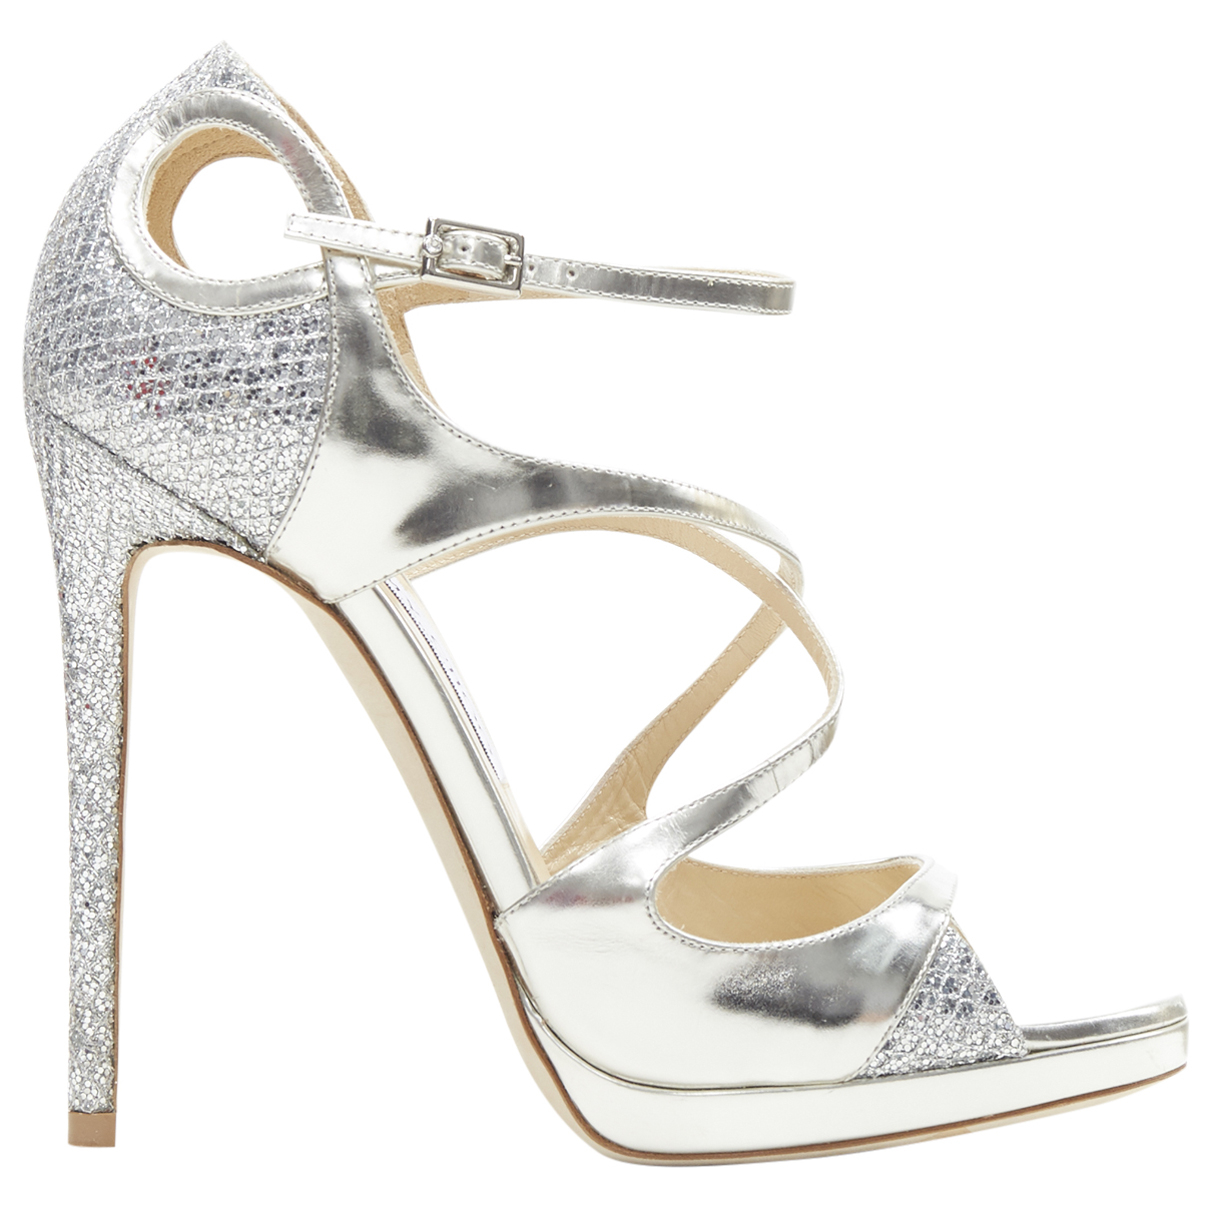 Jimmy Choo \N Silver Leather Sandals for Women 37 EU